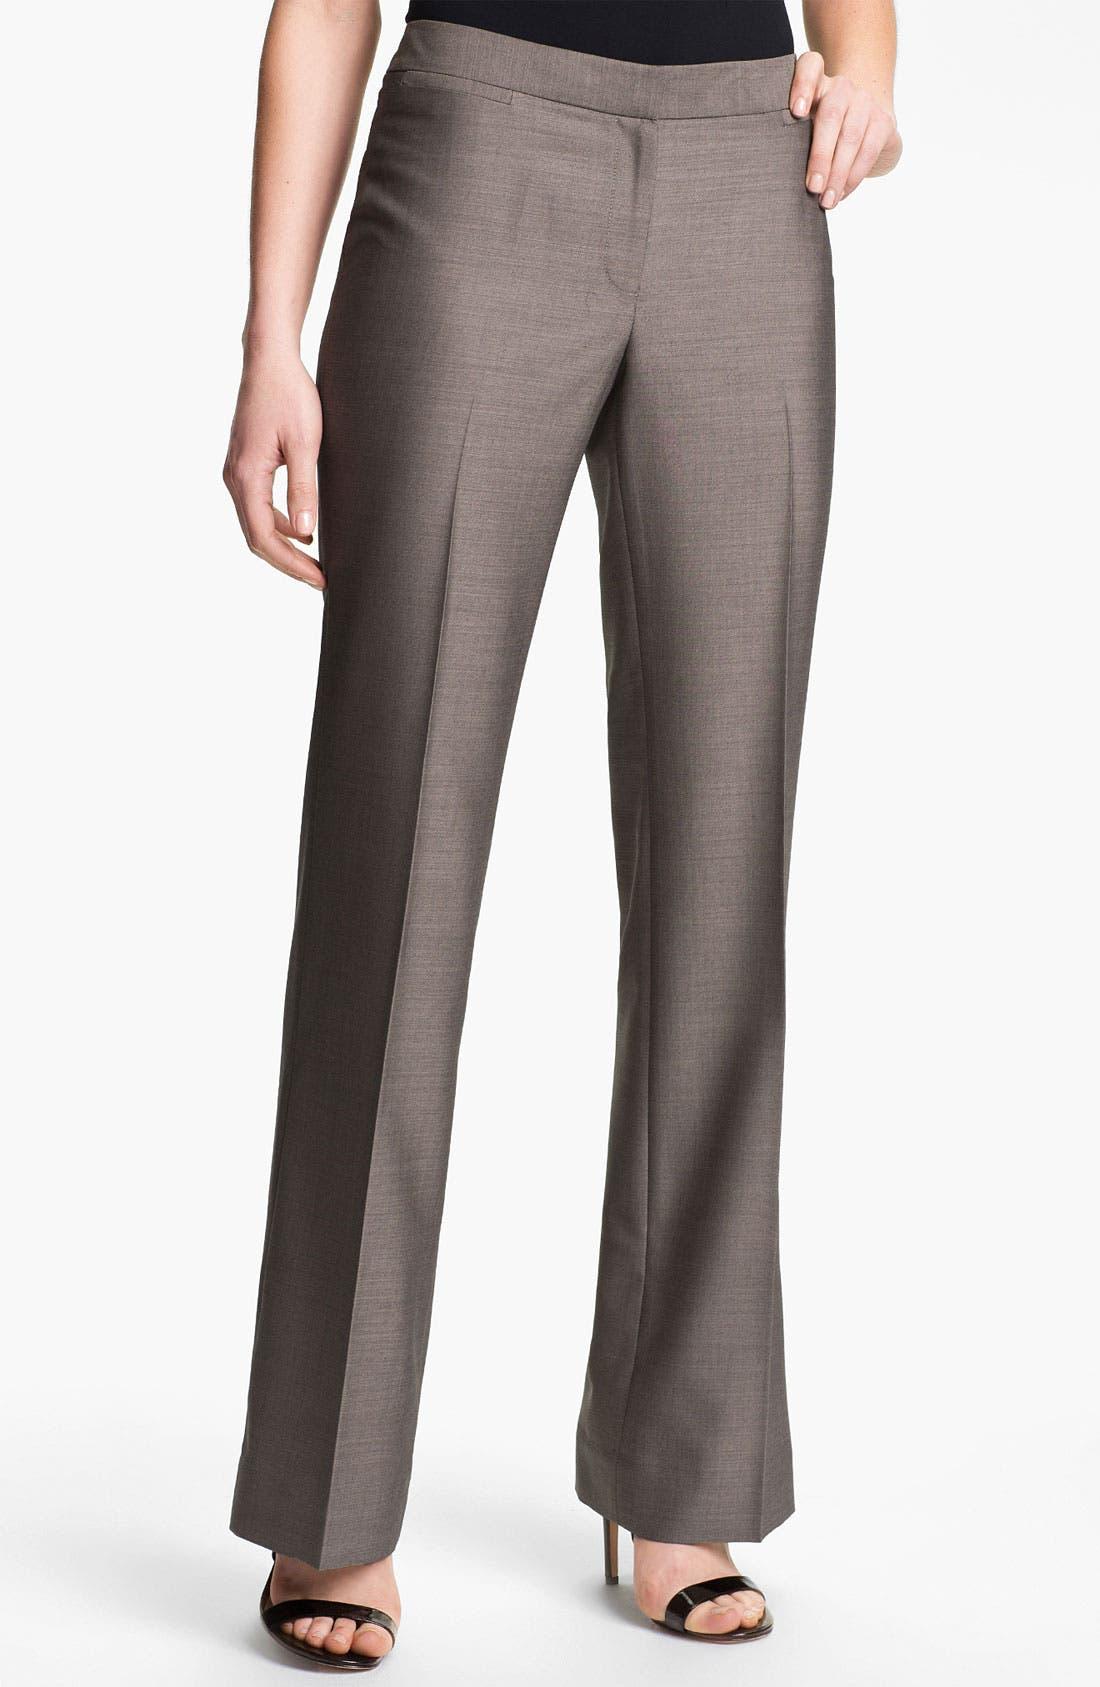 Alternate Image 1 Selected - Classiques Entier 'Tiverton' Suiting Pants